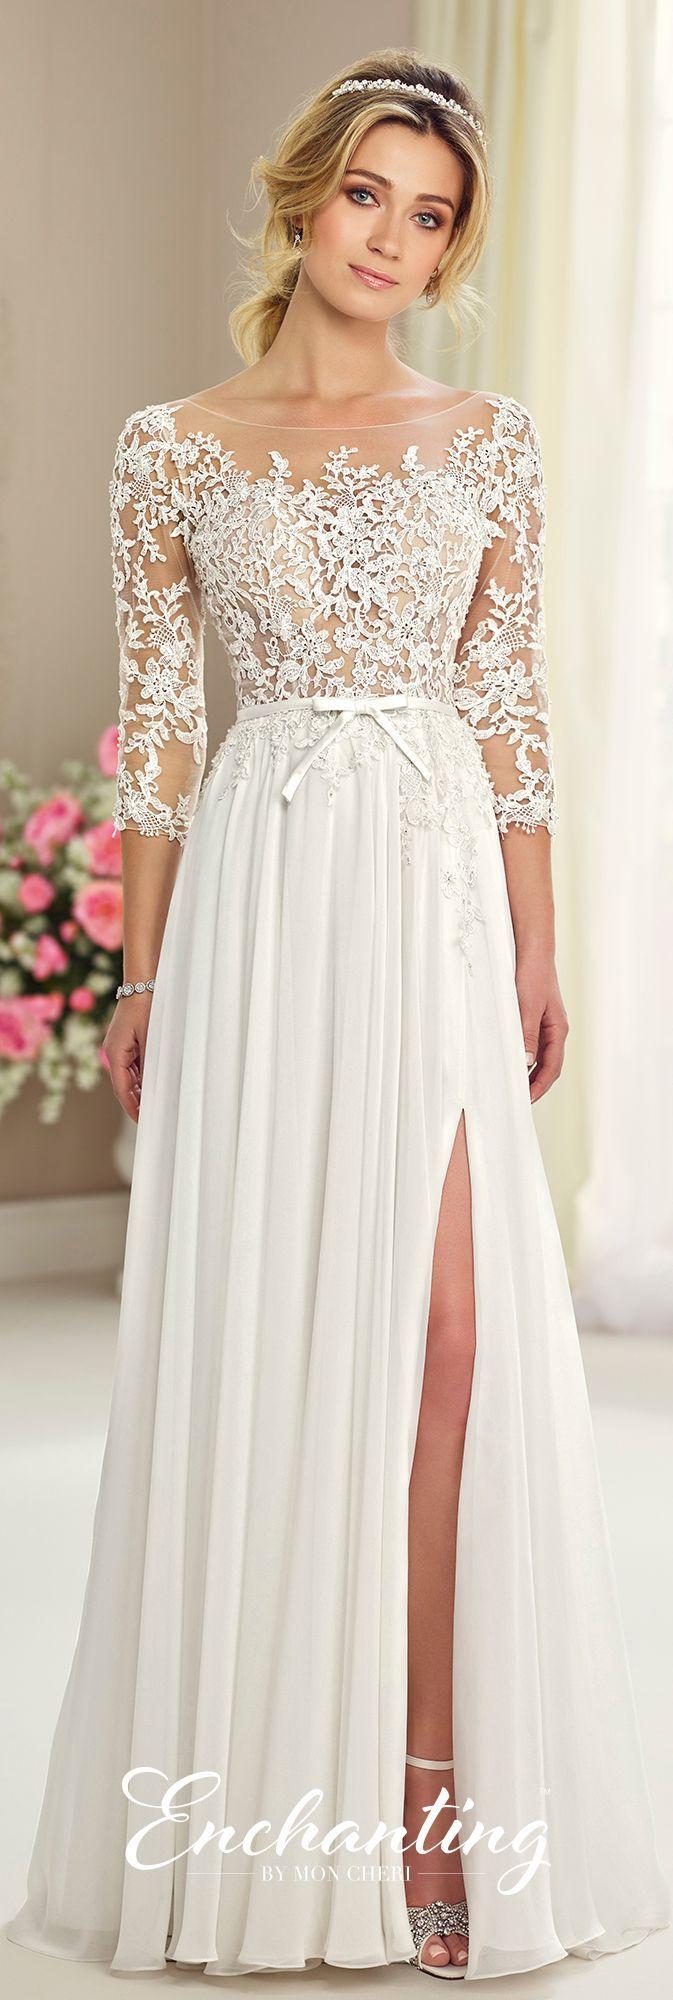 best wedding dresses images on pinterest wedding frocks gown